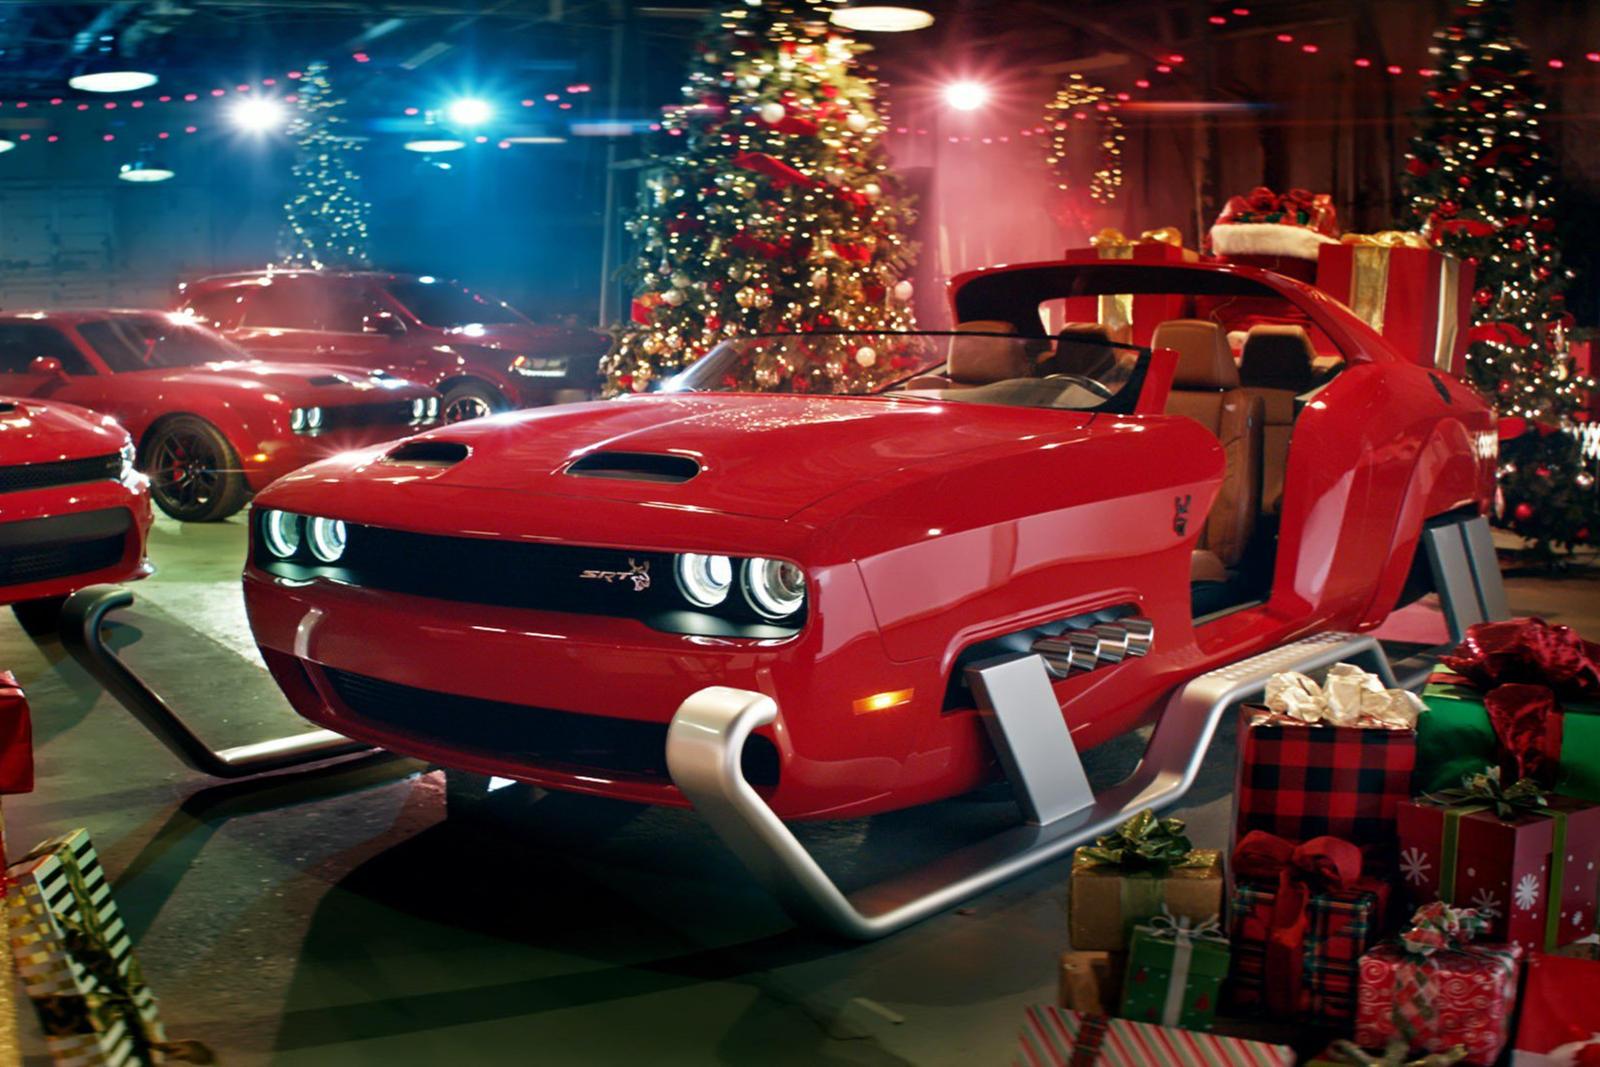 Santa S New Sleigh Is A Custom Dodge Challenger Srt Hellcat Redeye Carbuzz